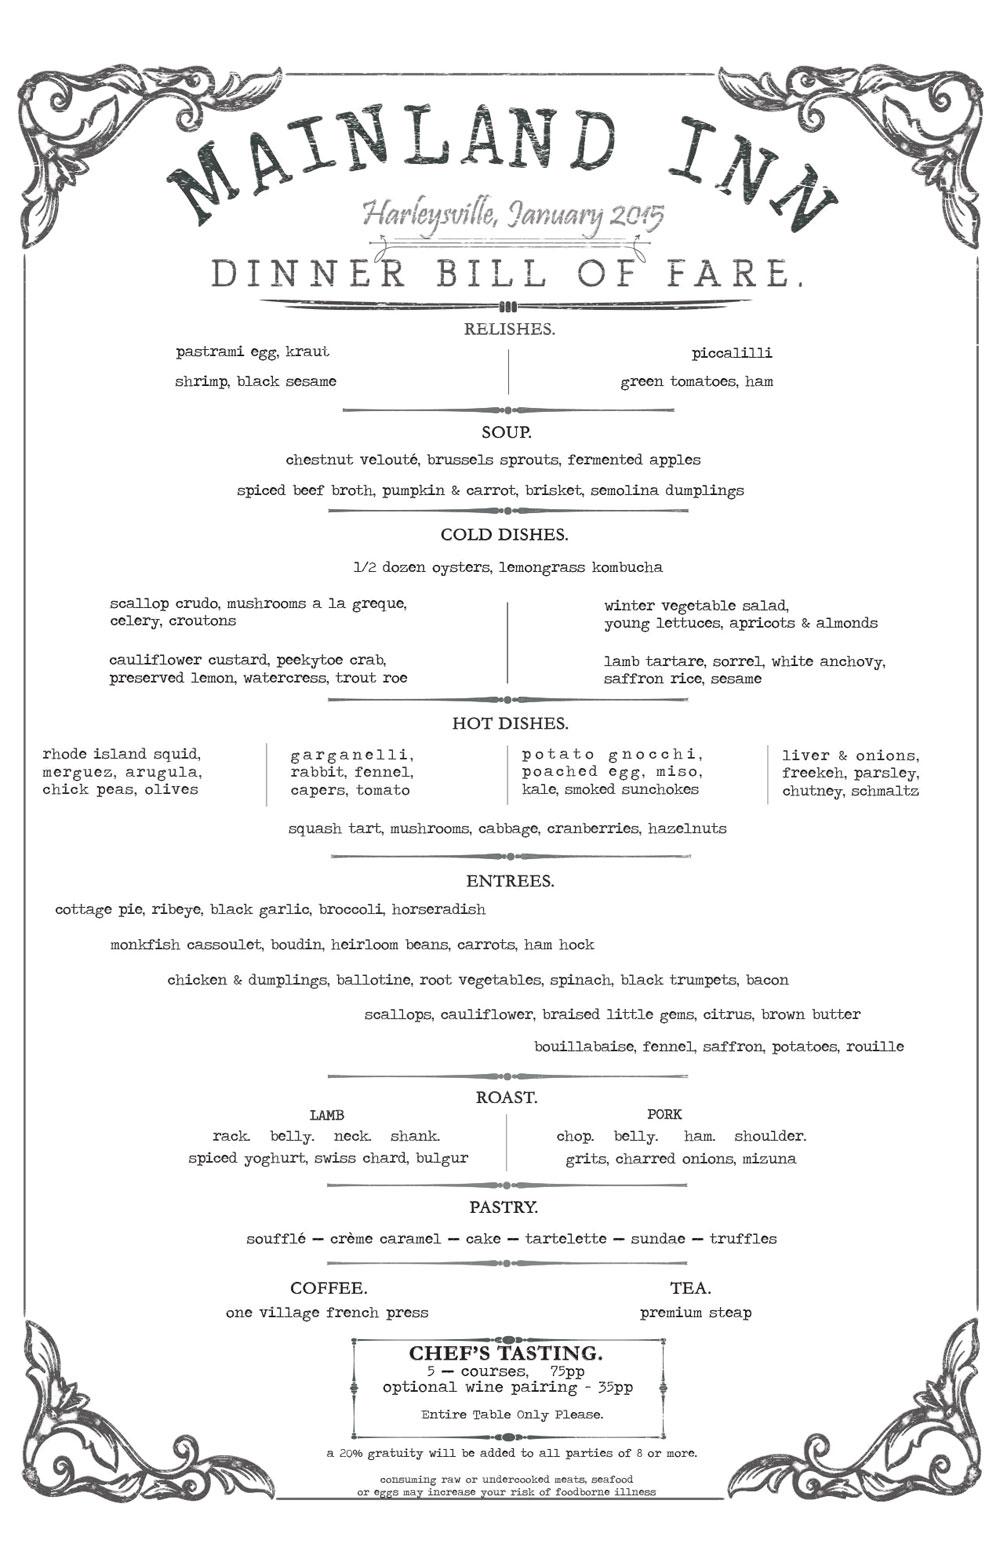 mainland-inn-menu-preview